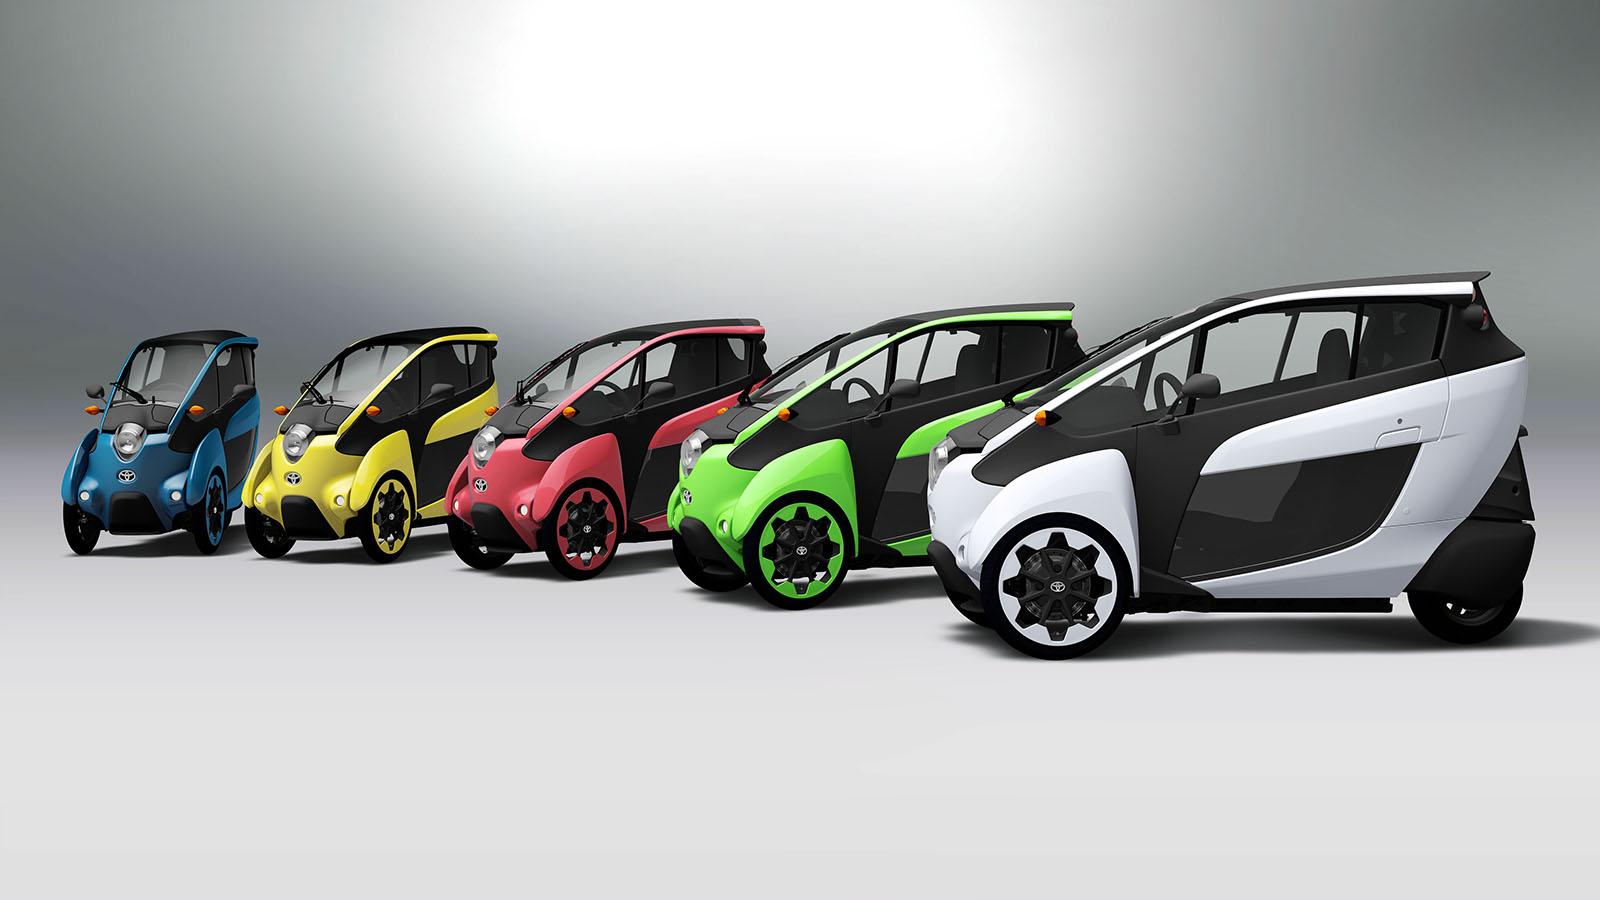 Toyota iRoad one-passenger concept cars, image courtesy Toyota.